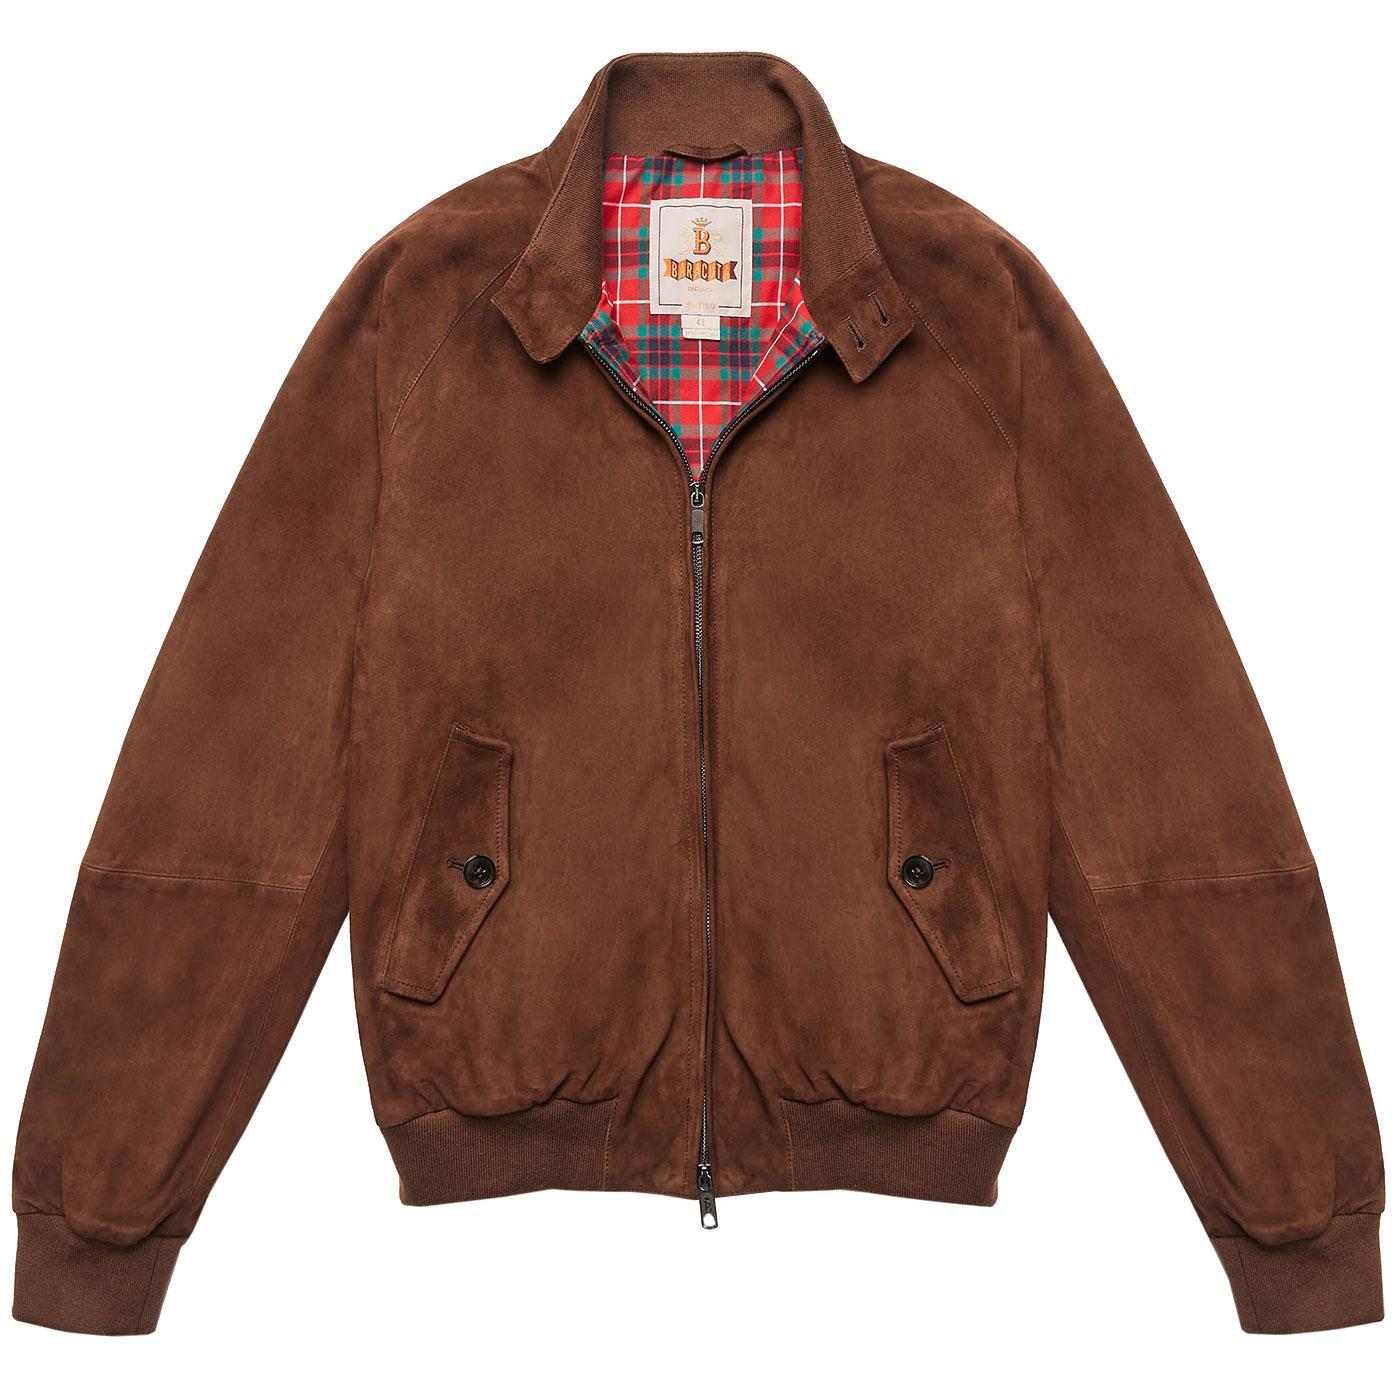 BARACUTA G9 Suede Mod Harrington Jacket CHOCOLATE